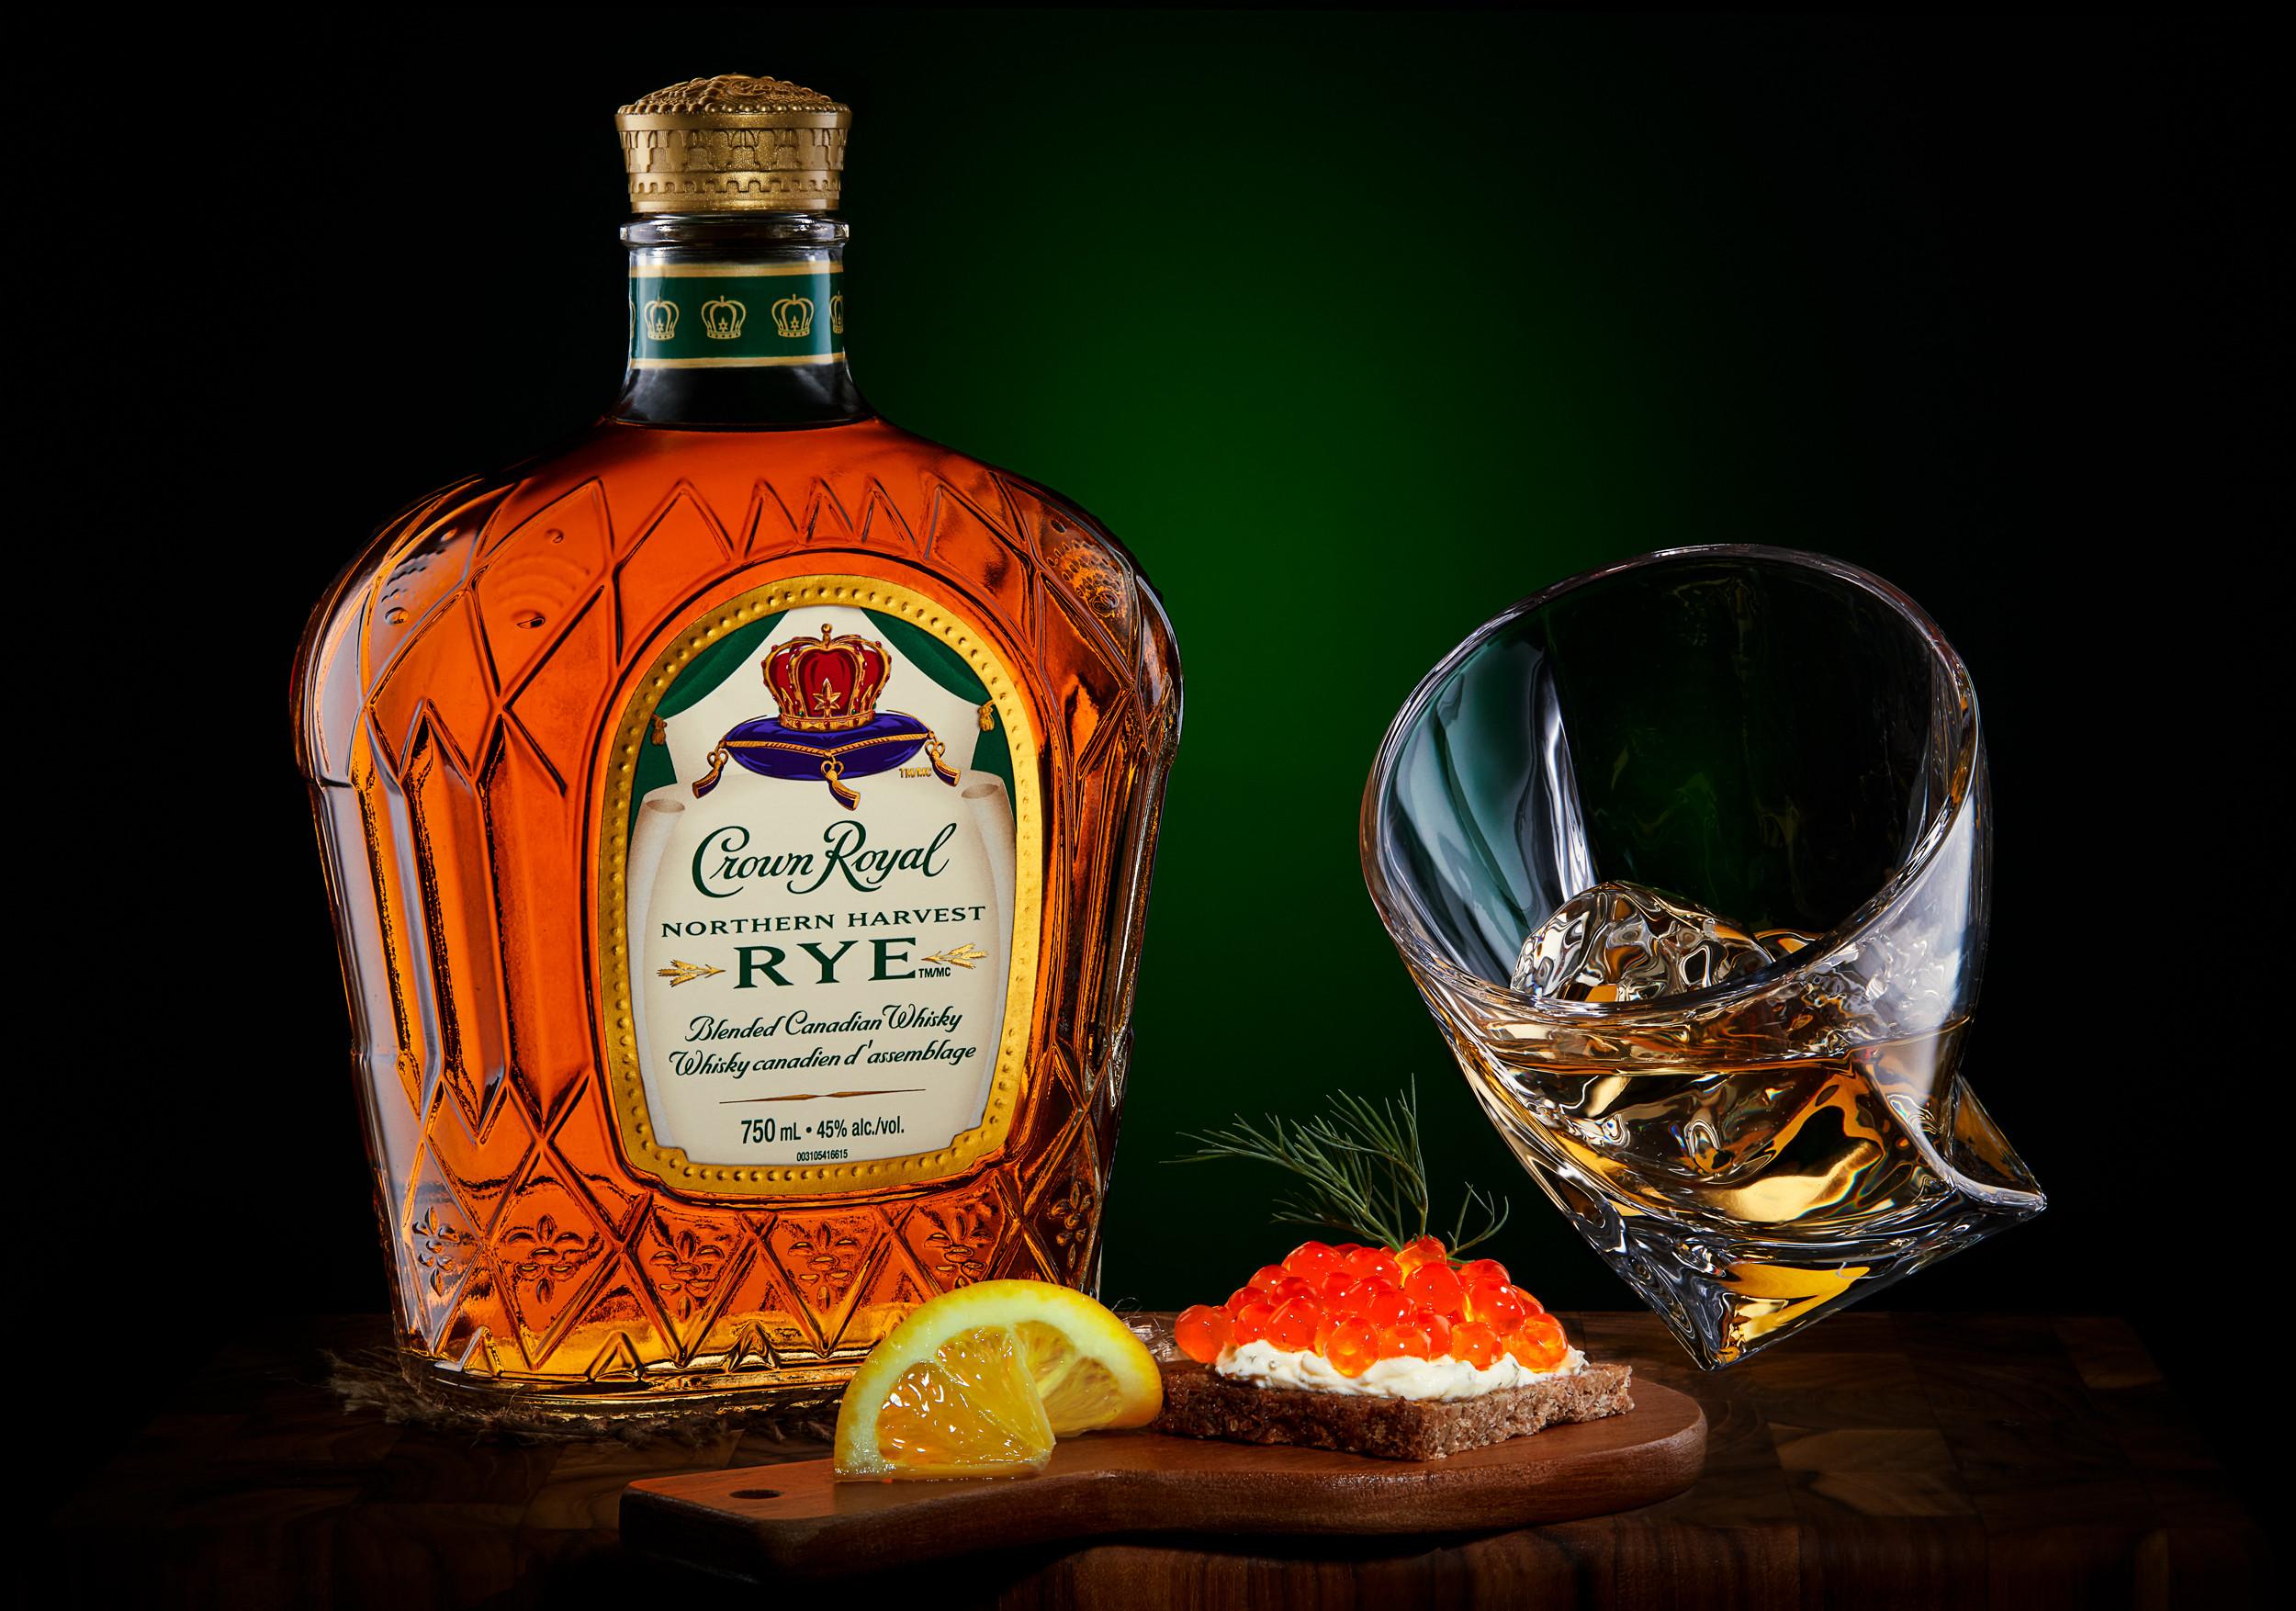 Crown Royal RYE Whisky.